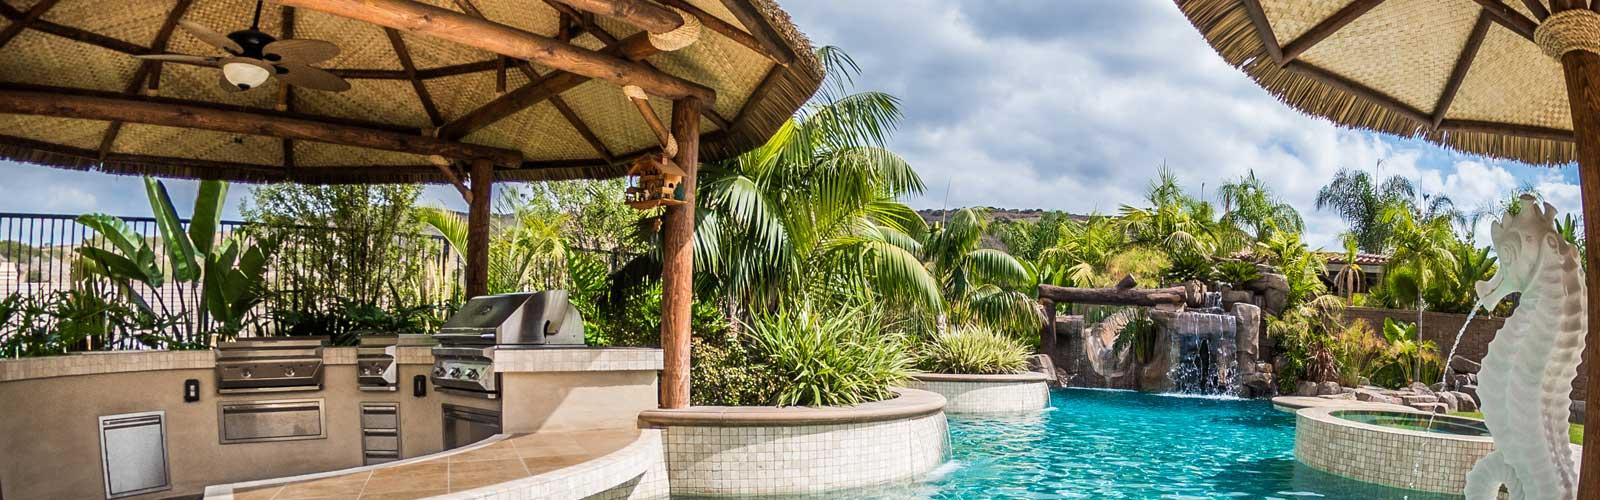 drc-pools-custom-cabanas-pools